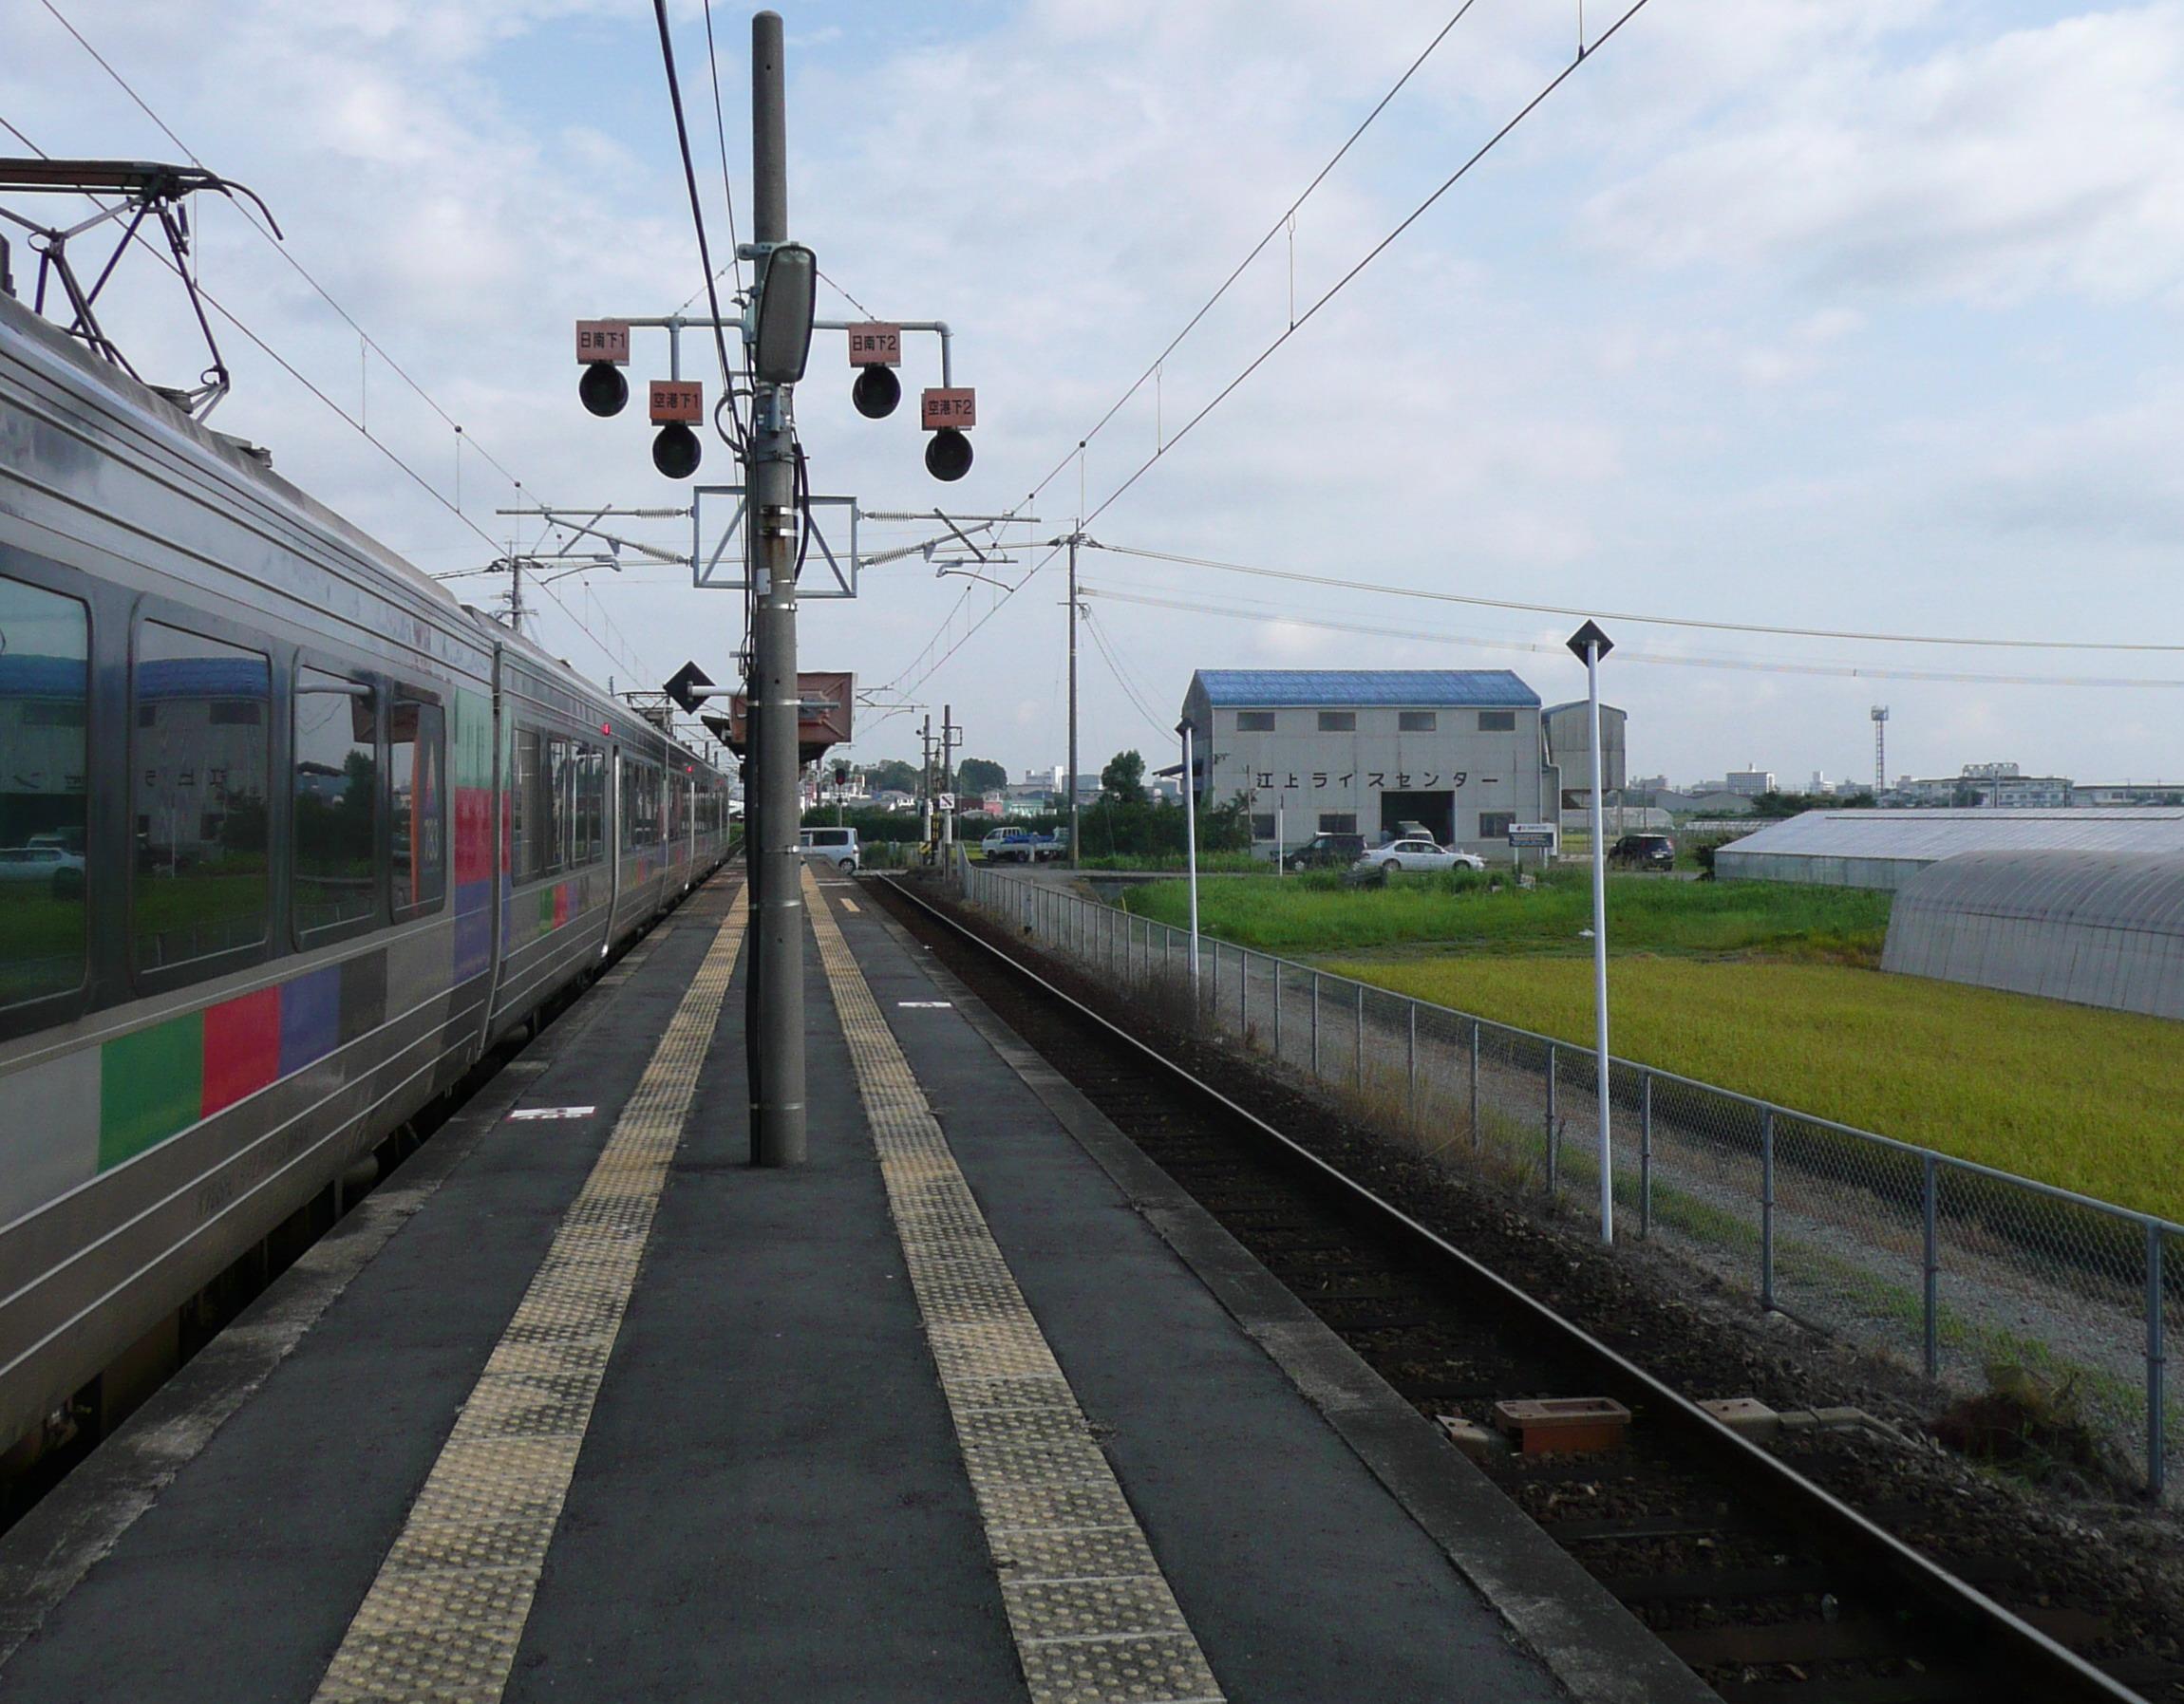 https://upload.wikimedia.org/wikipedia/commons/3/32/Tayoshi_station_home.jpg